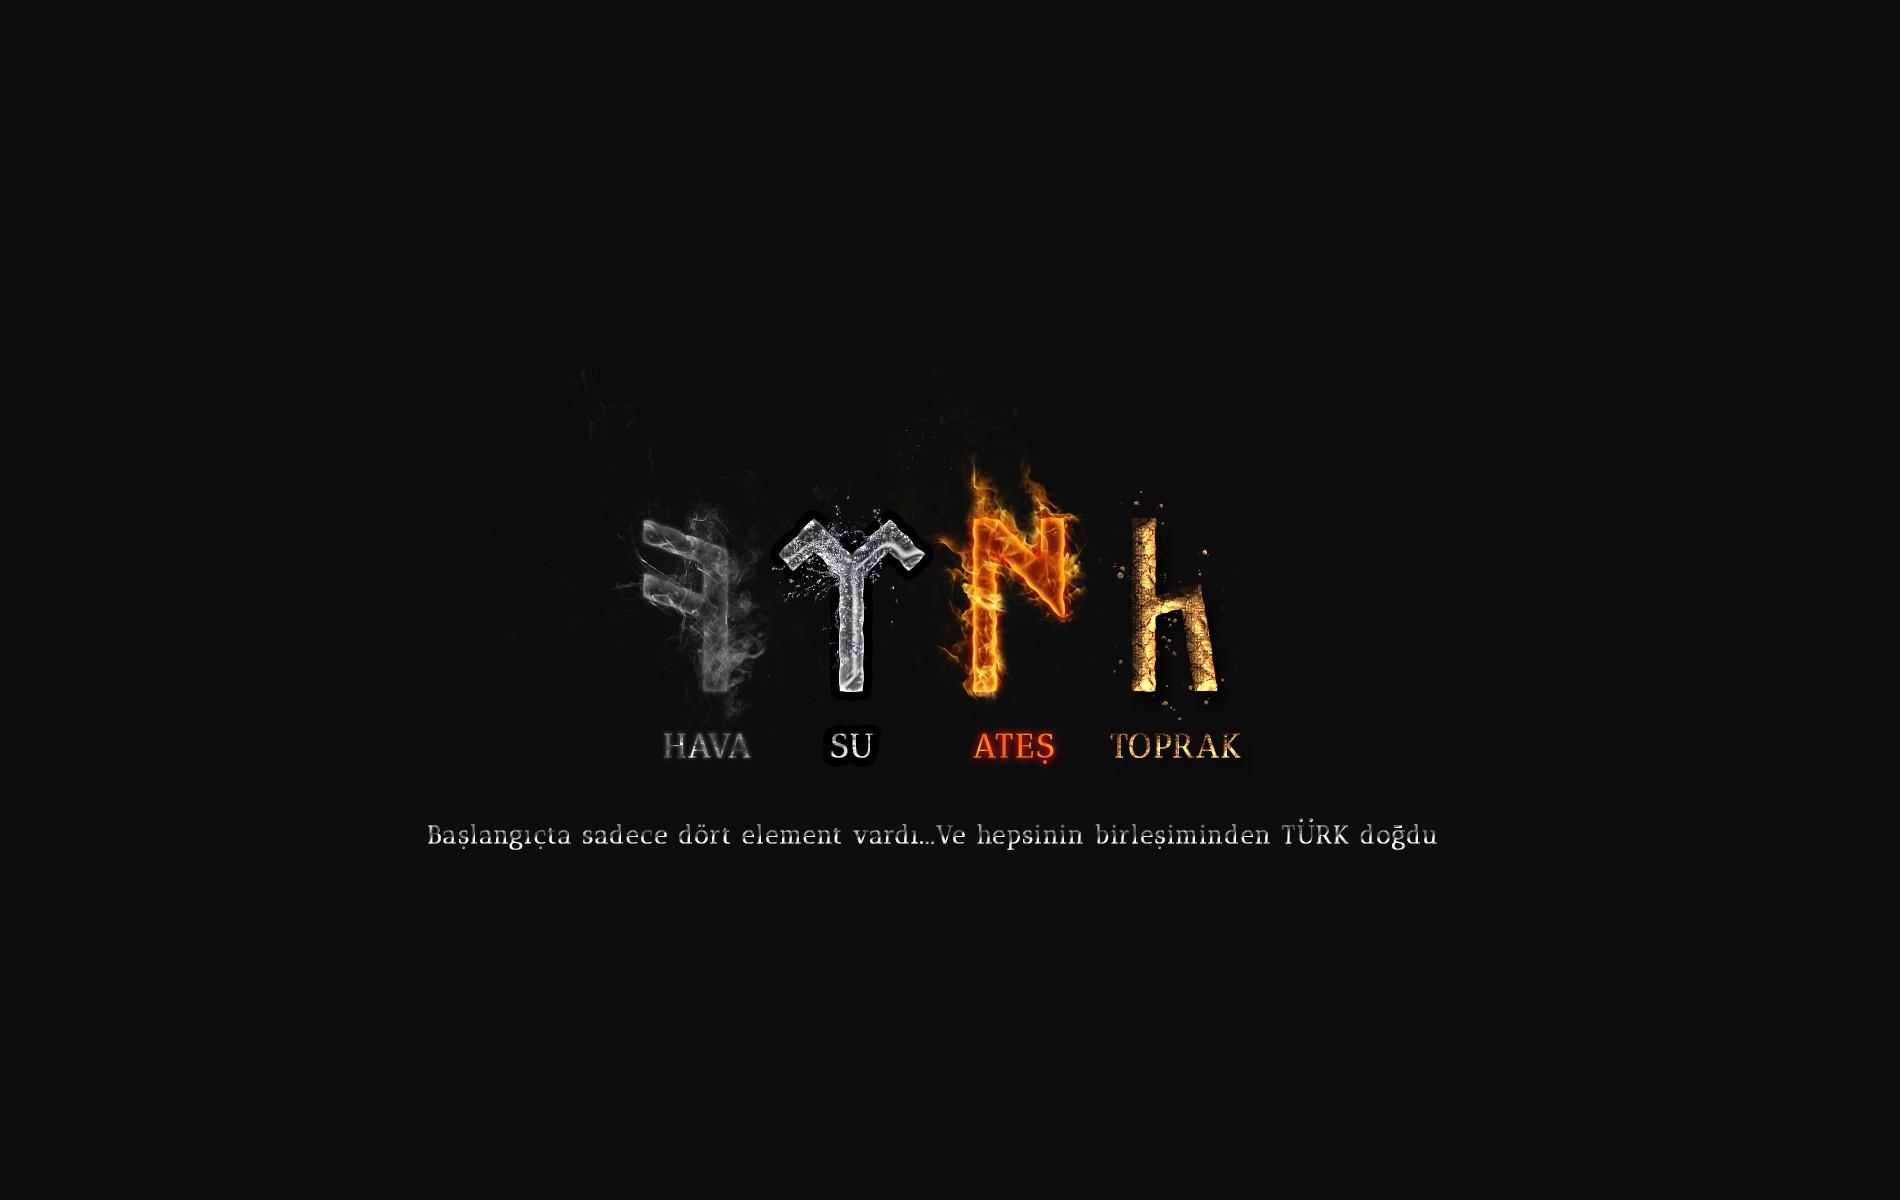 Digital Art Night Text Logo Graphic Design Turkish Letter Brand G Kt Rkler Runic Alphabet